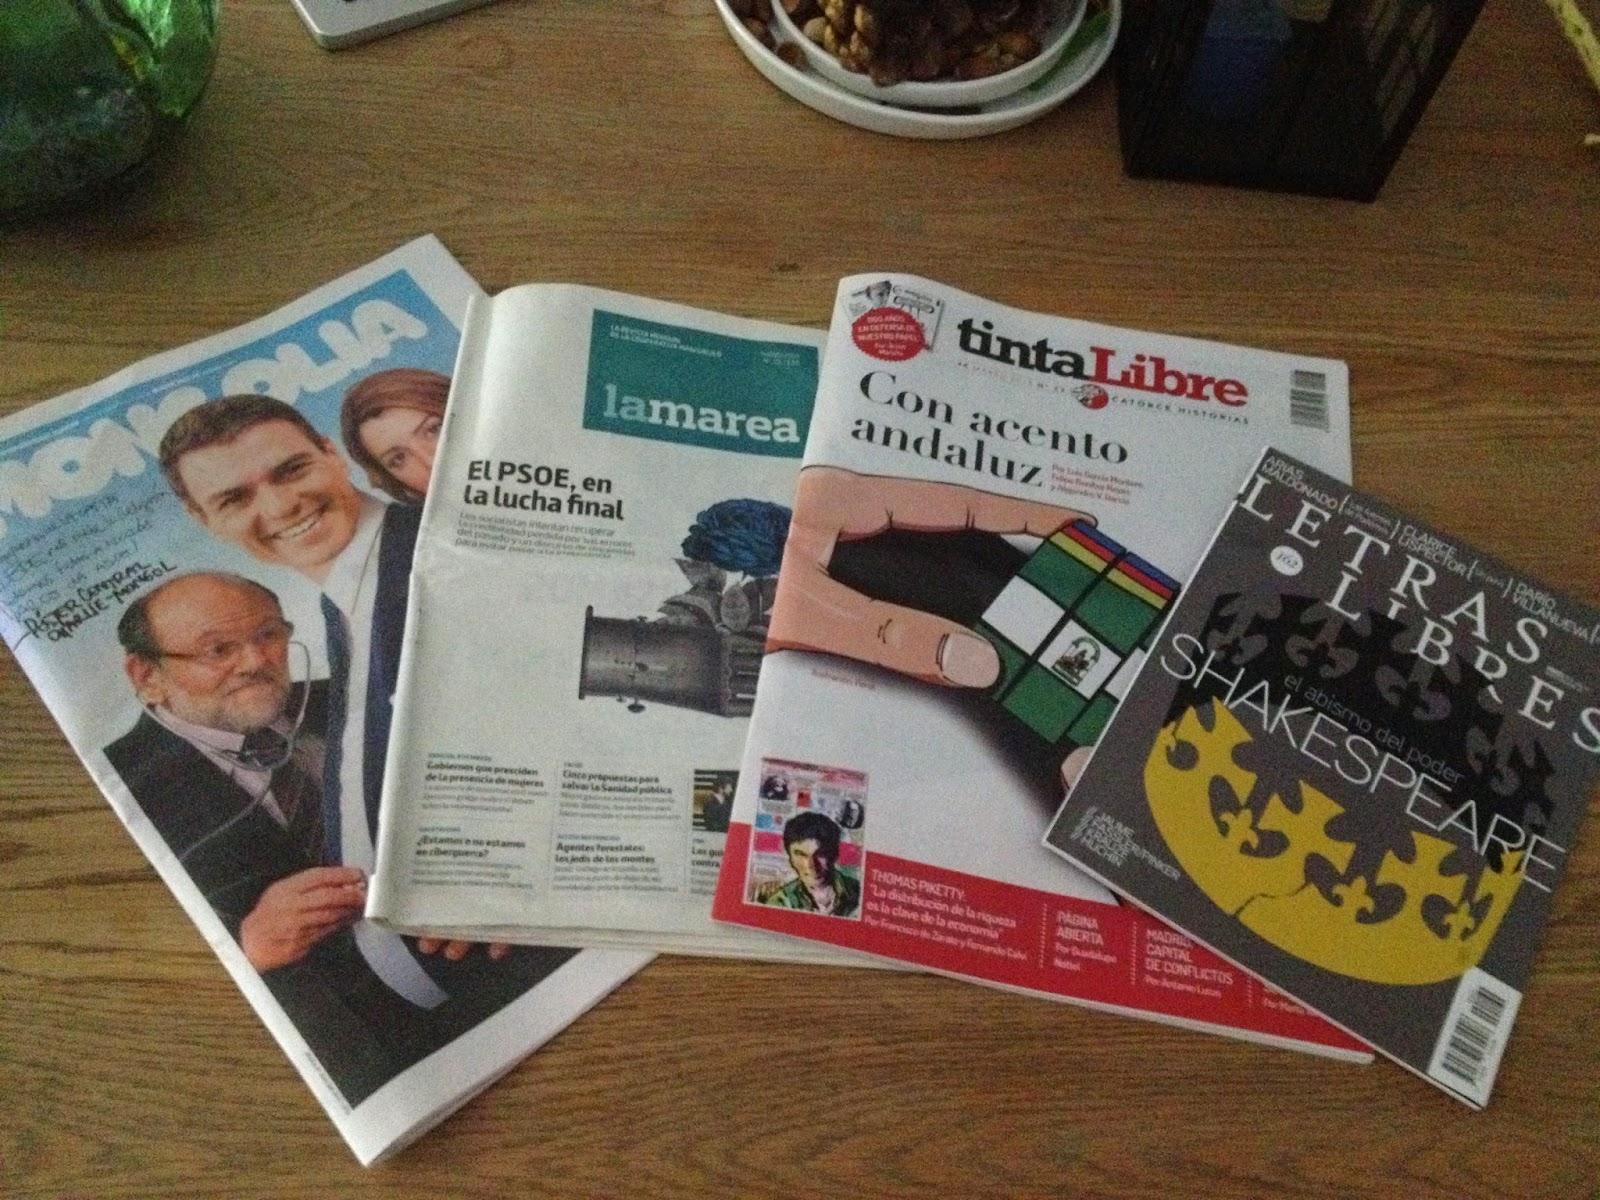 prensa-la marea-tinta libre-infolibre-actualidad-letras libres-mongolia